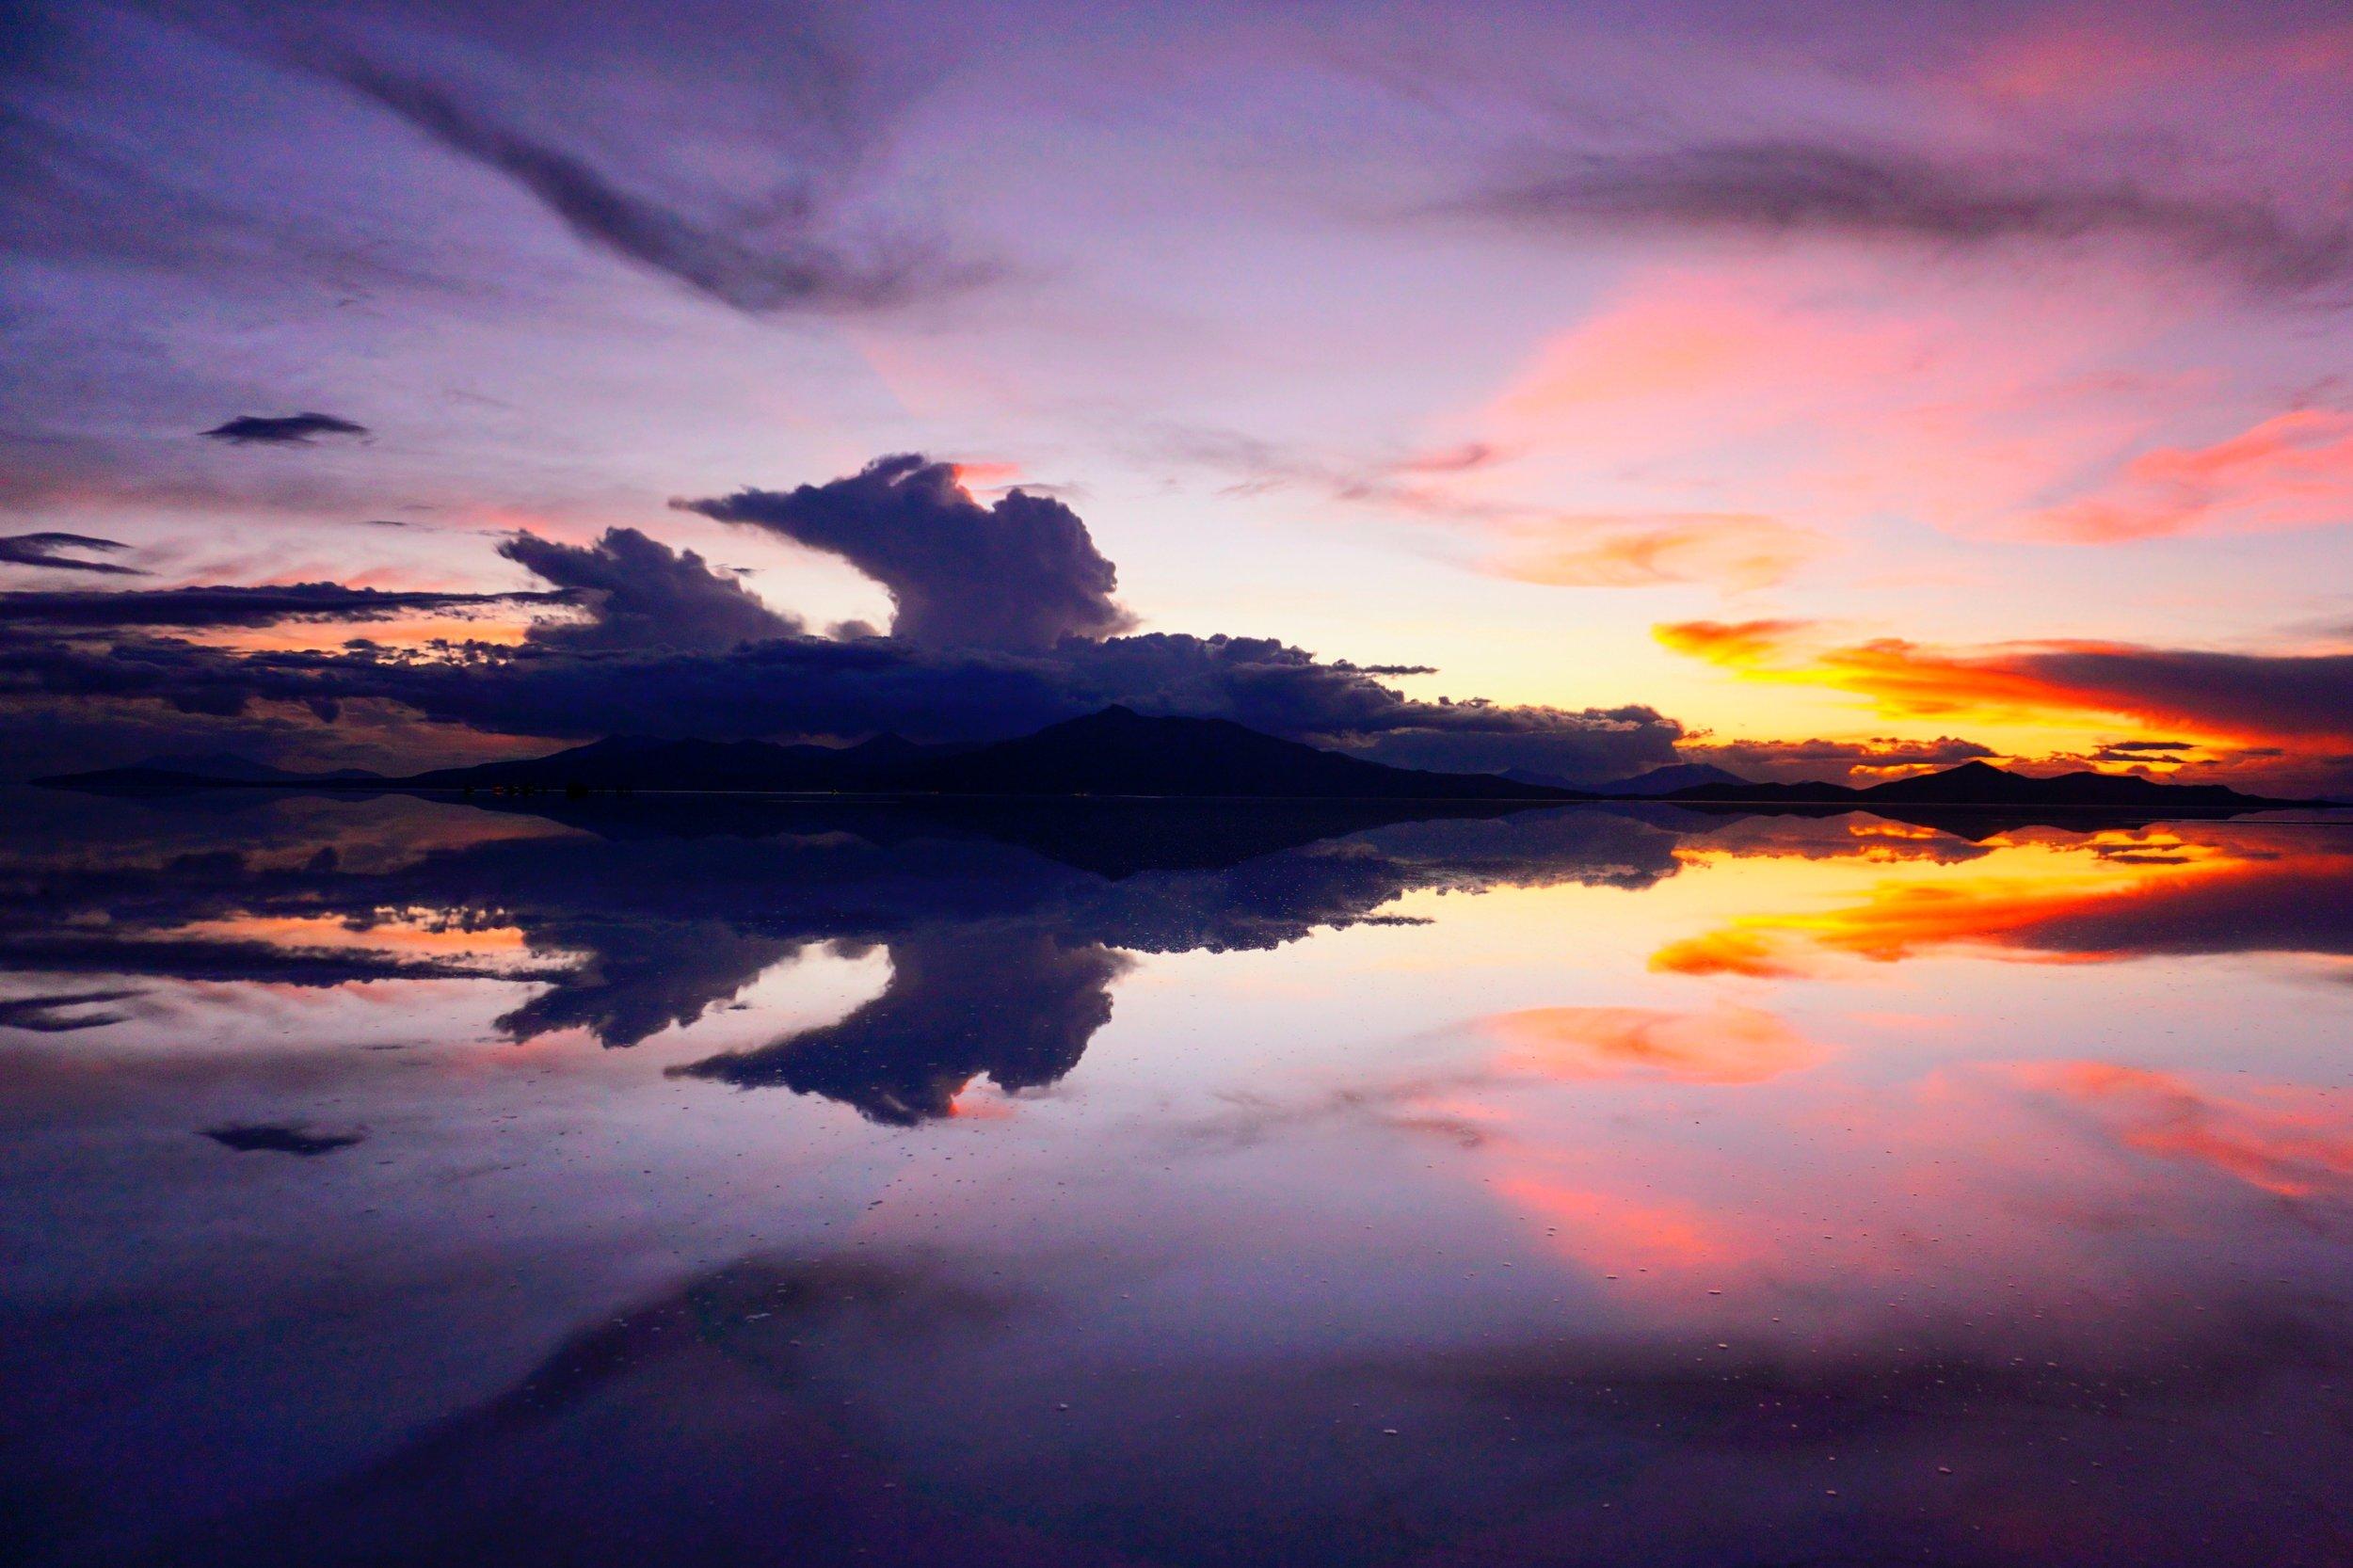 backlit-body-of-water-bolivia-1745497.jpg